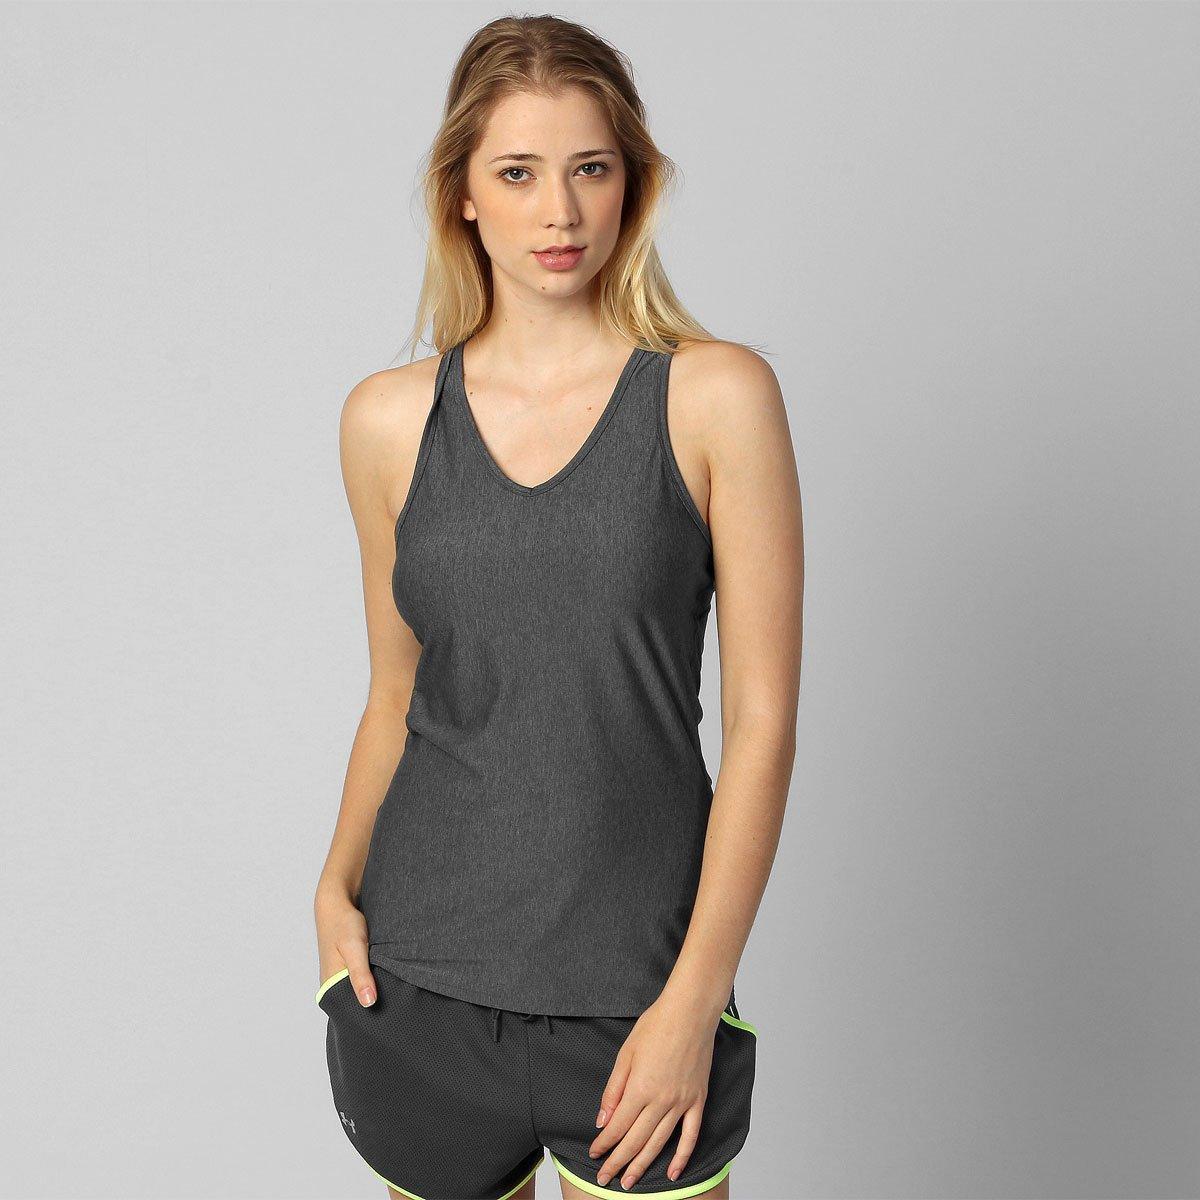 1f5e8571226 Camiseta Regata Under Armour Sonic Feminina - Compre Agora